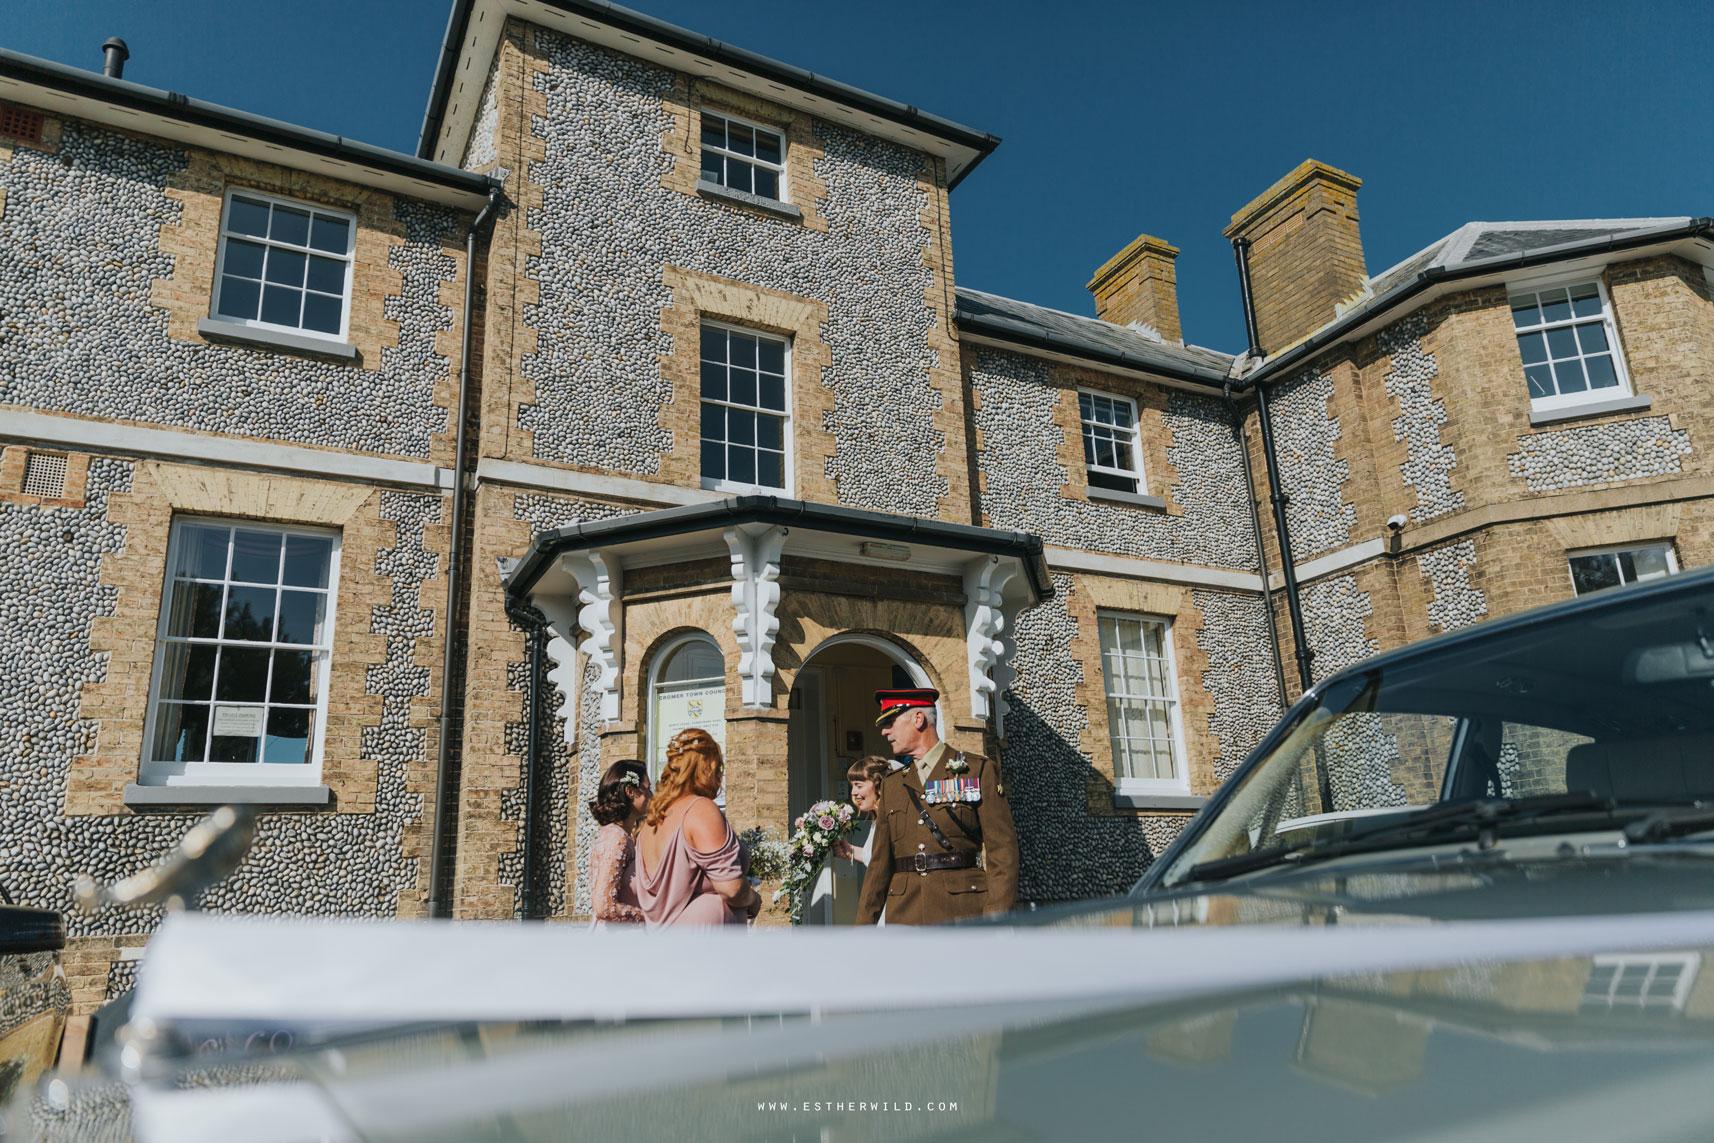 Cromer_Wedding_Beach_Outdoor_Ceremony_Norfolk_North_Lodge_Registry_Office_Rocket_House_Cafe_Cromer_Pier_IMG_3593_IMGL7806.jpg